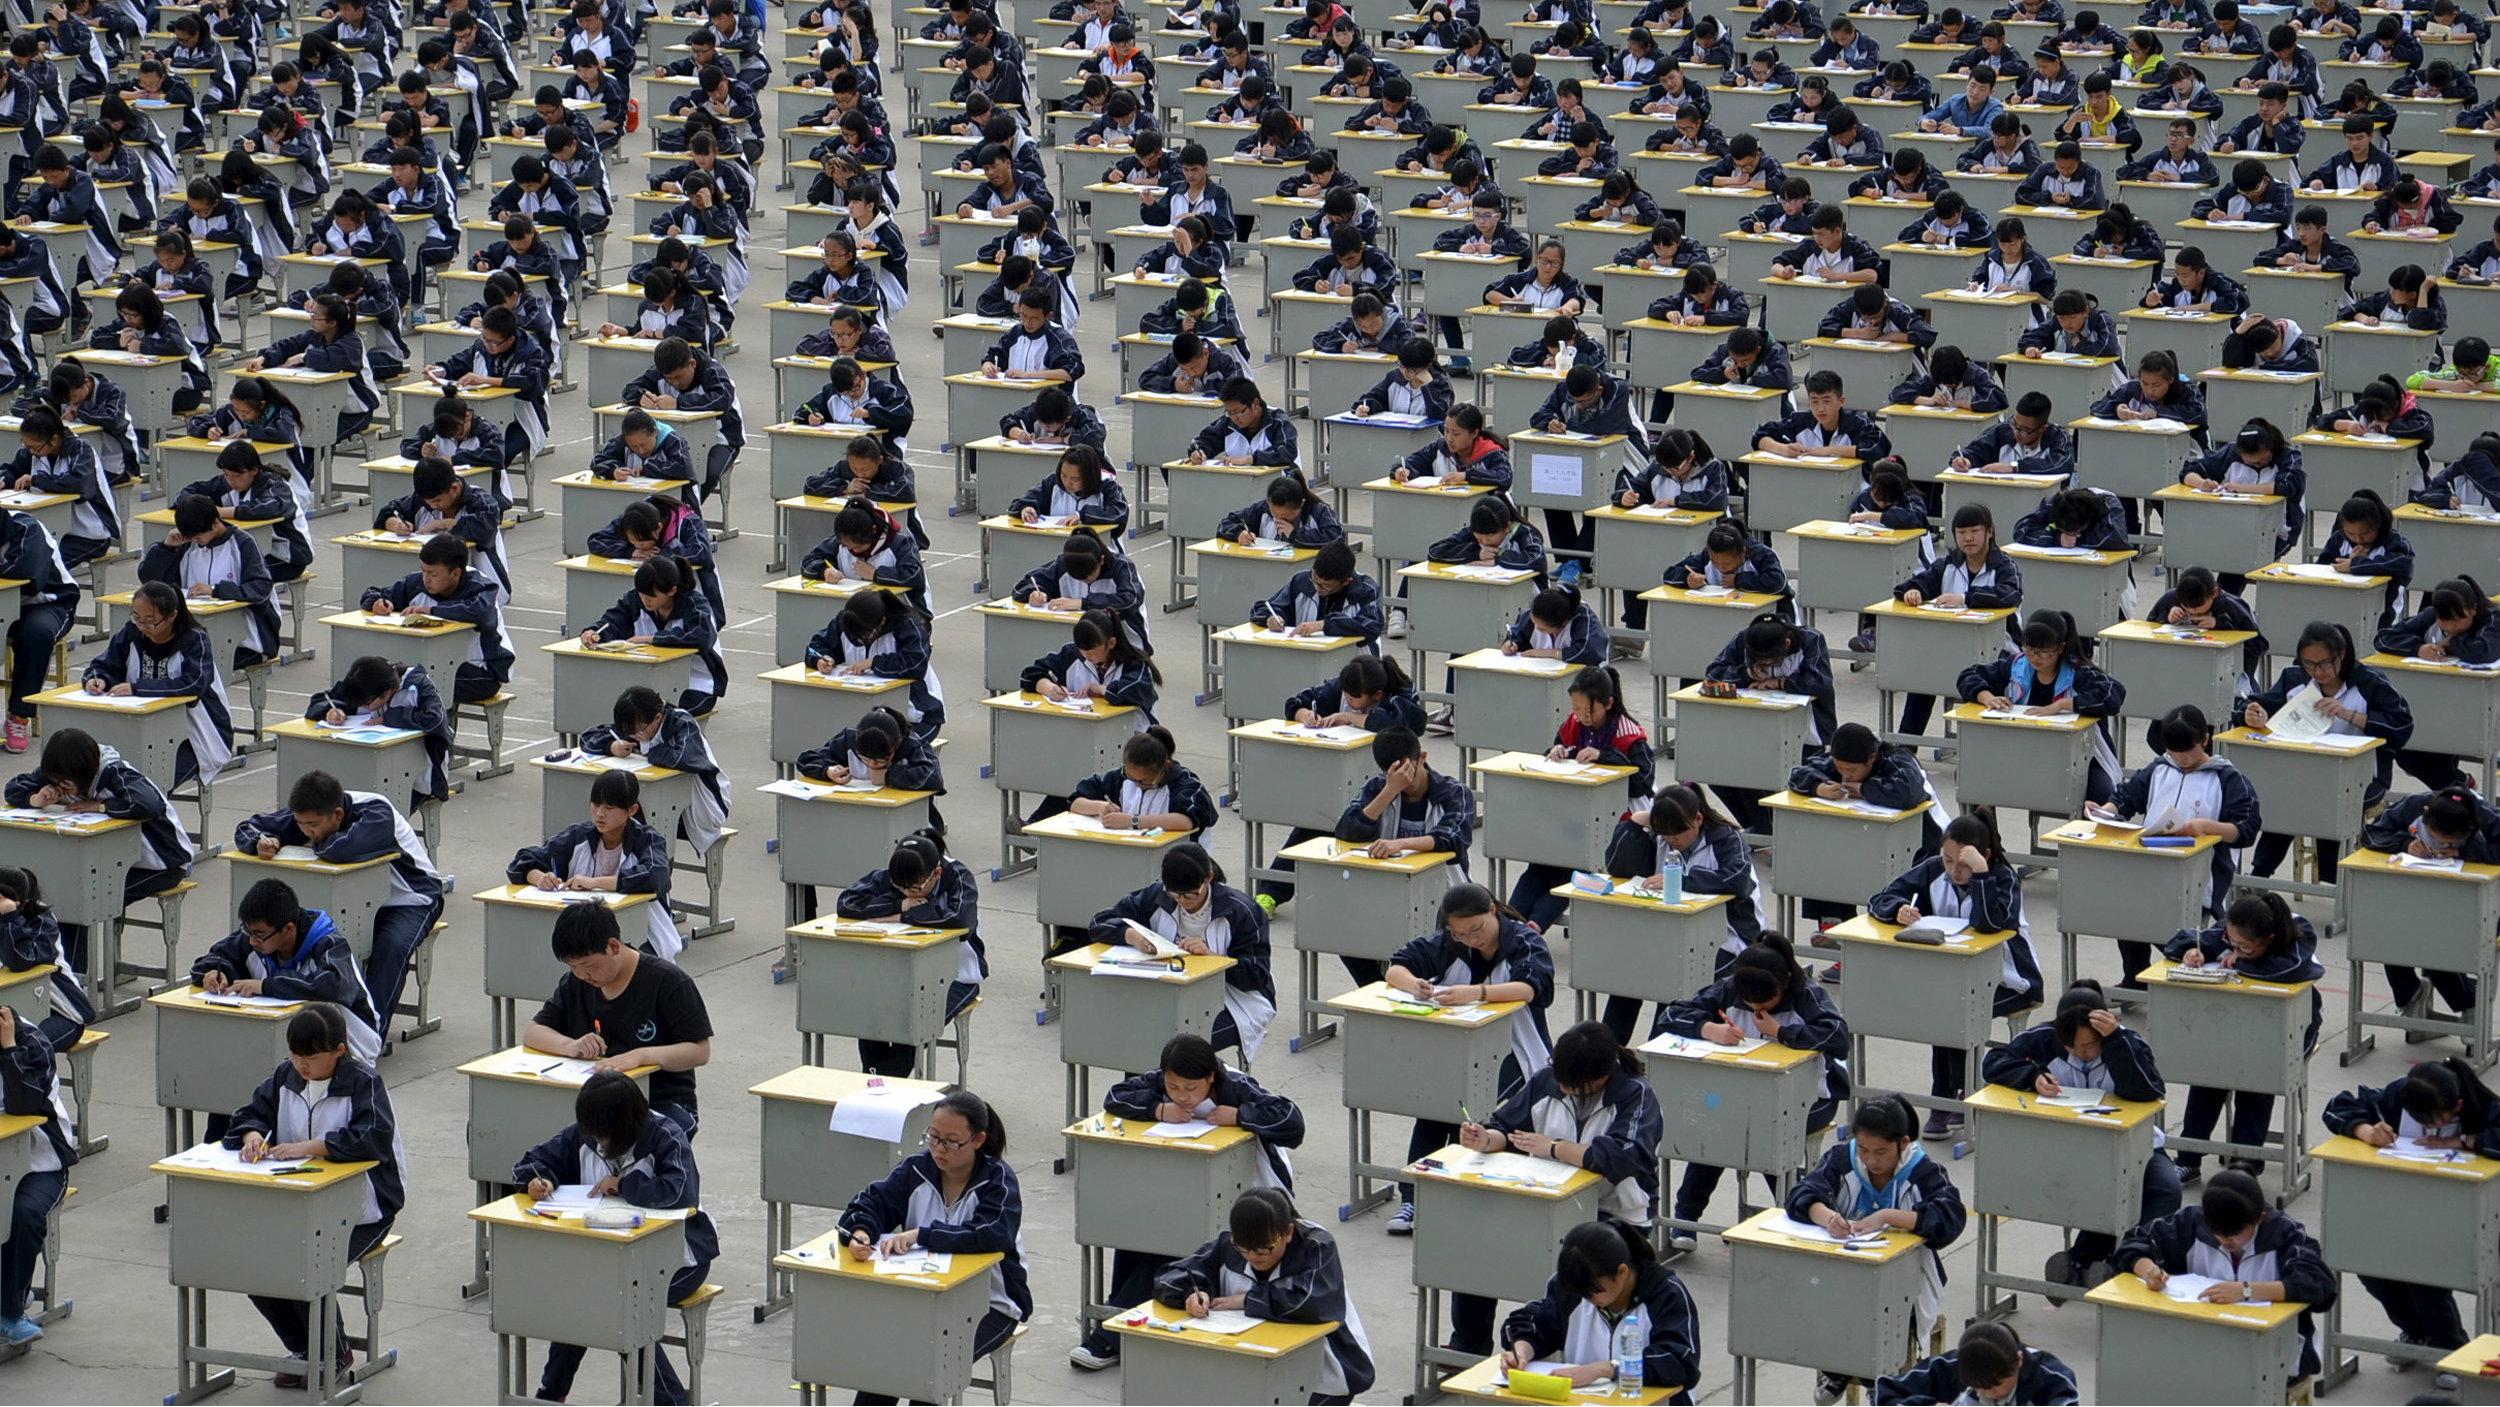 Students take exams